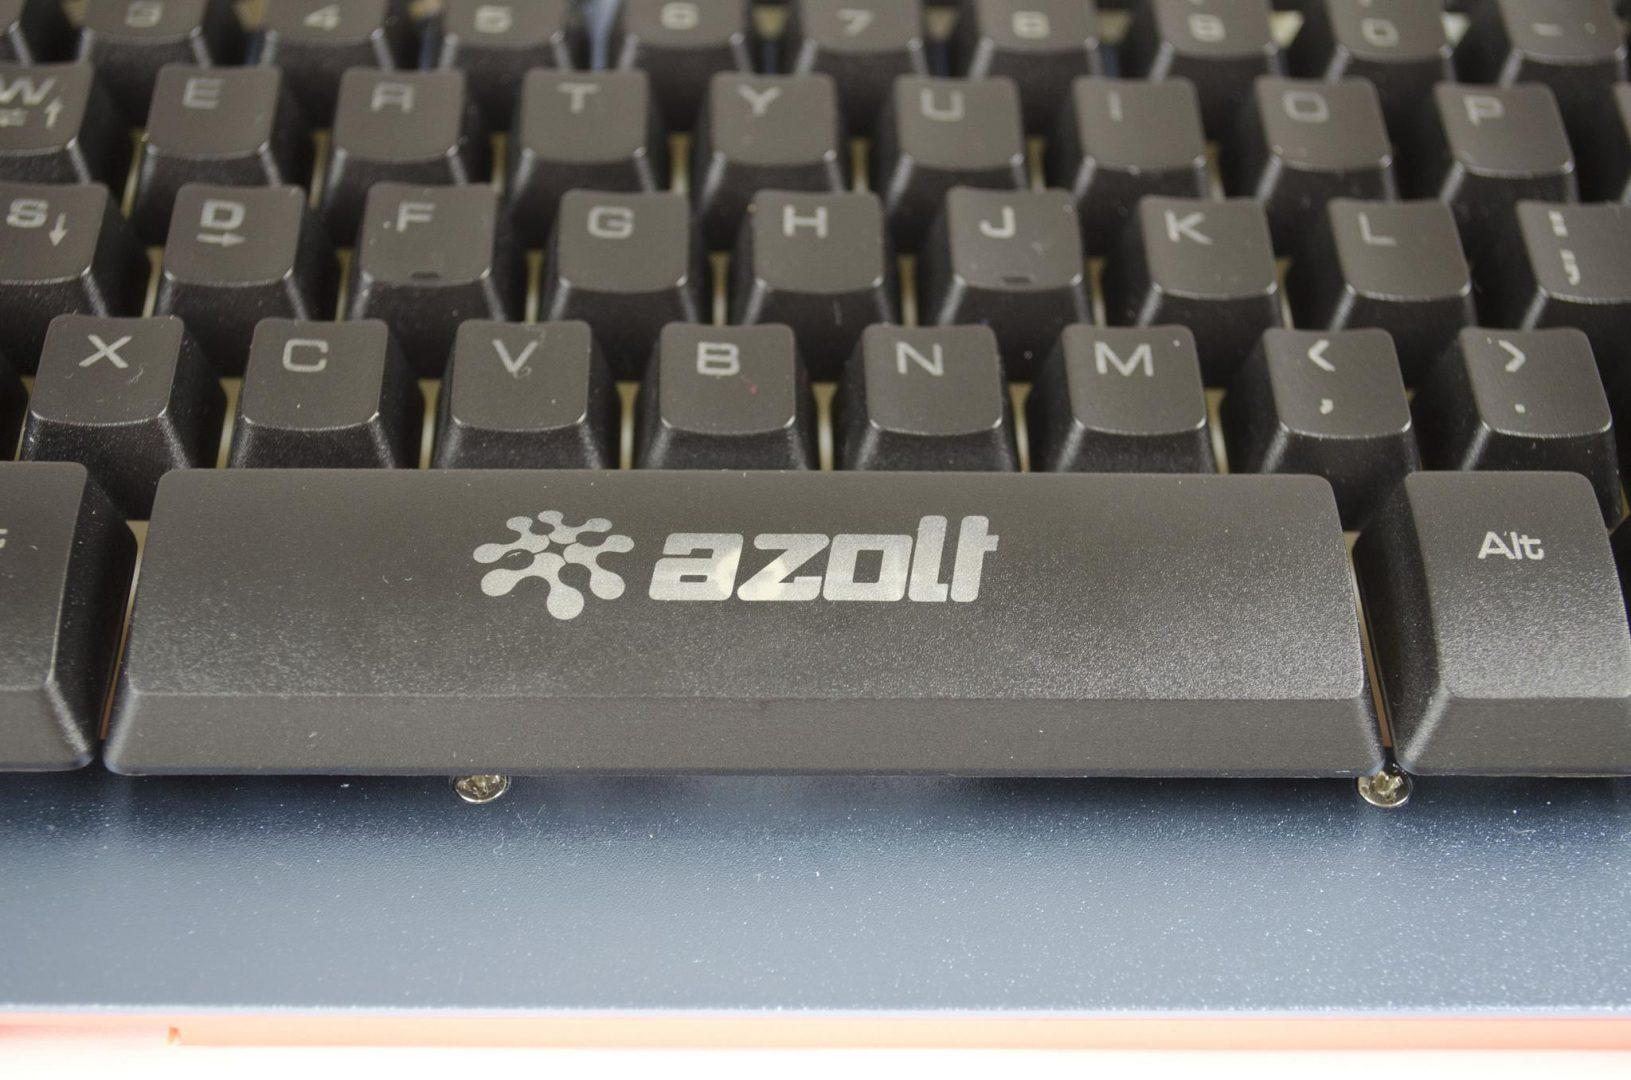 Azolt gCrusayder keyboard review_4